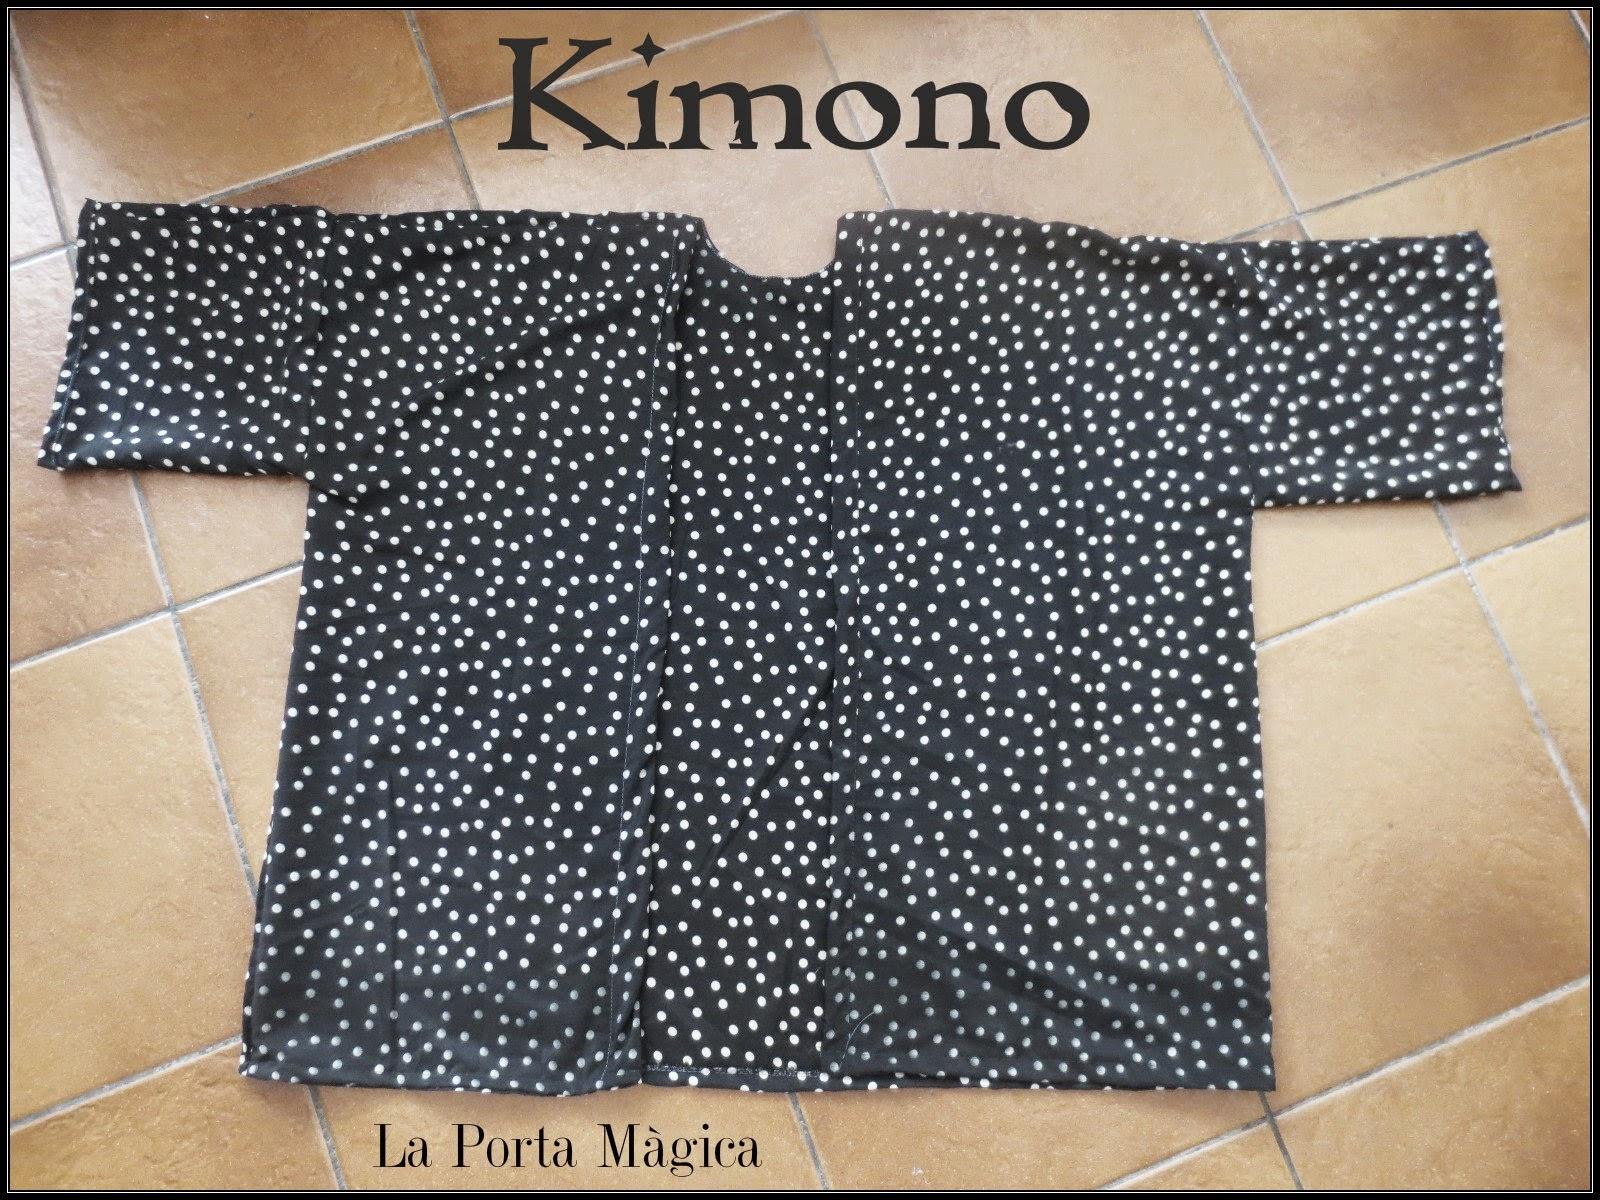 http://laportamagica.blogspot.com.es/2014/06/kimono-de-verano-diy.html